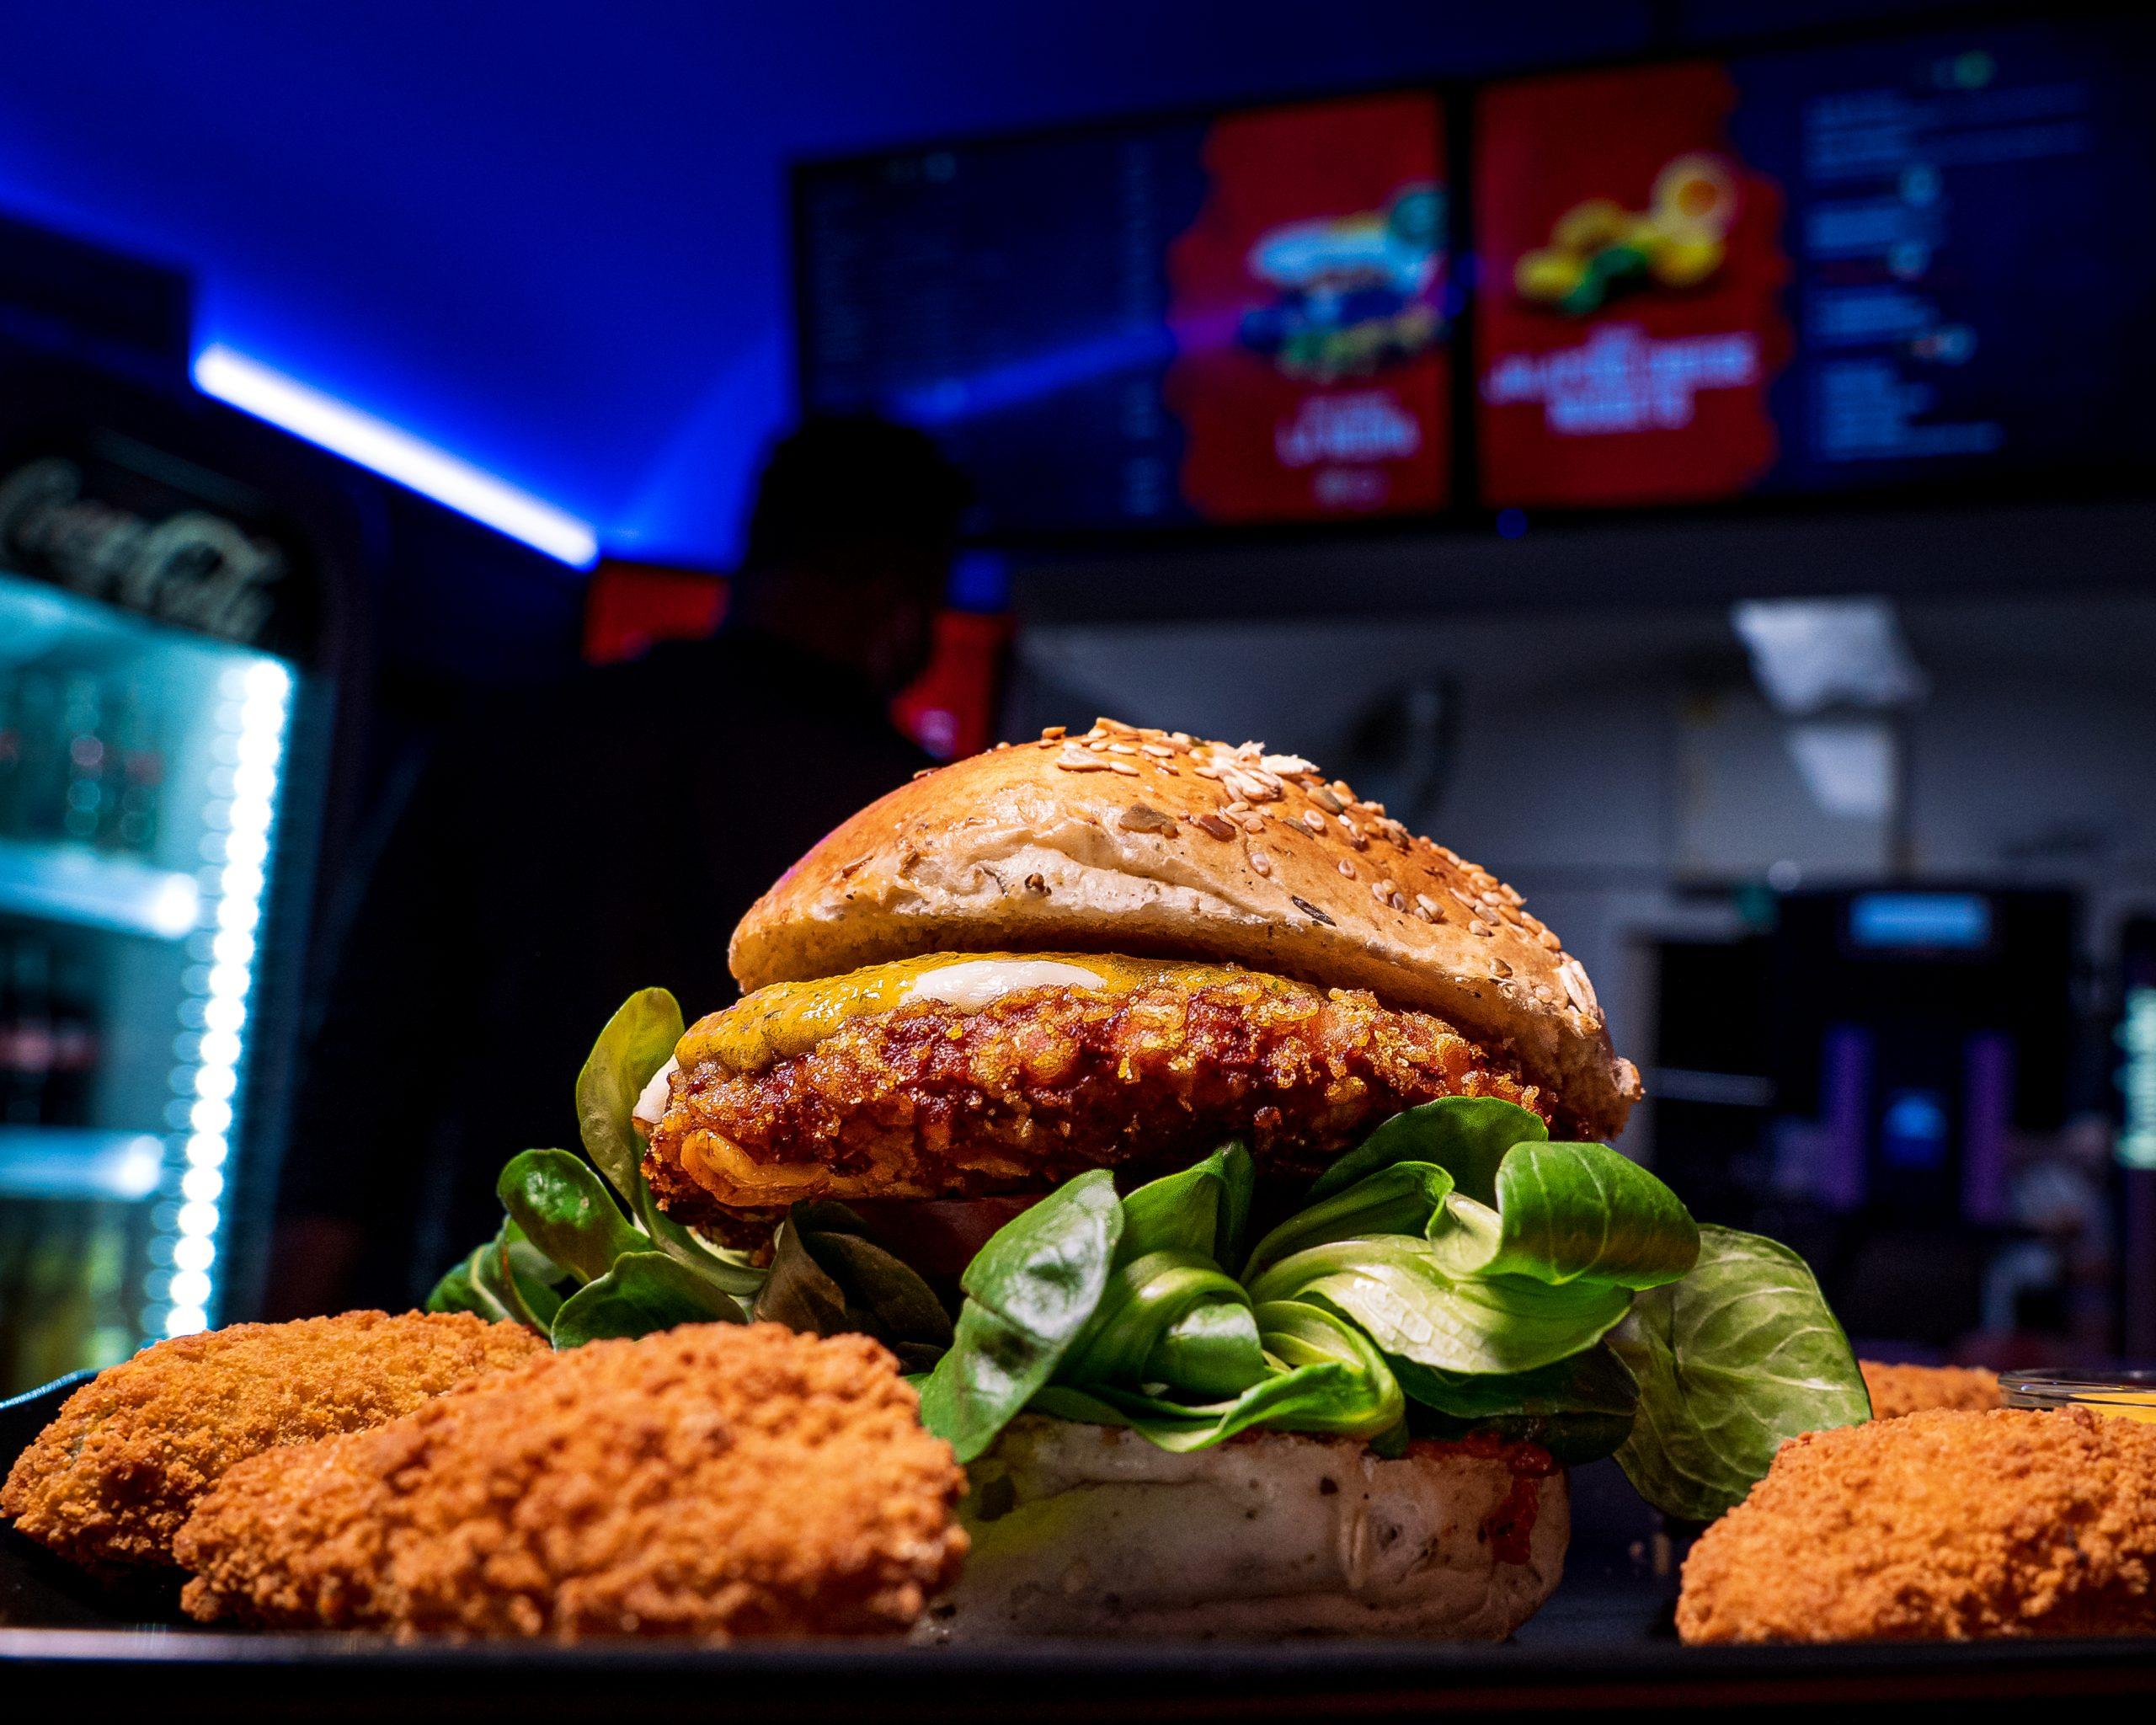 ersteklasse burger by dreamcode.de